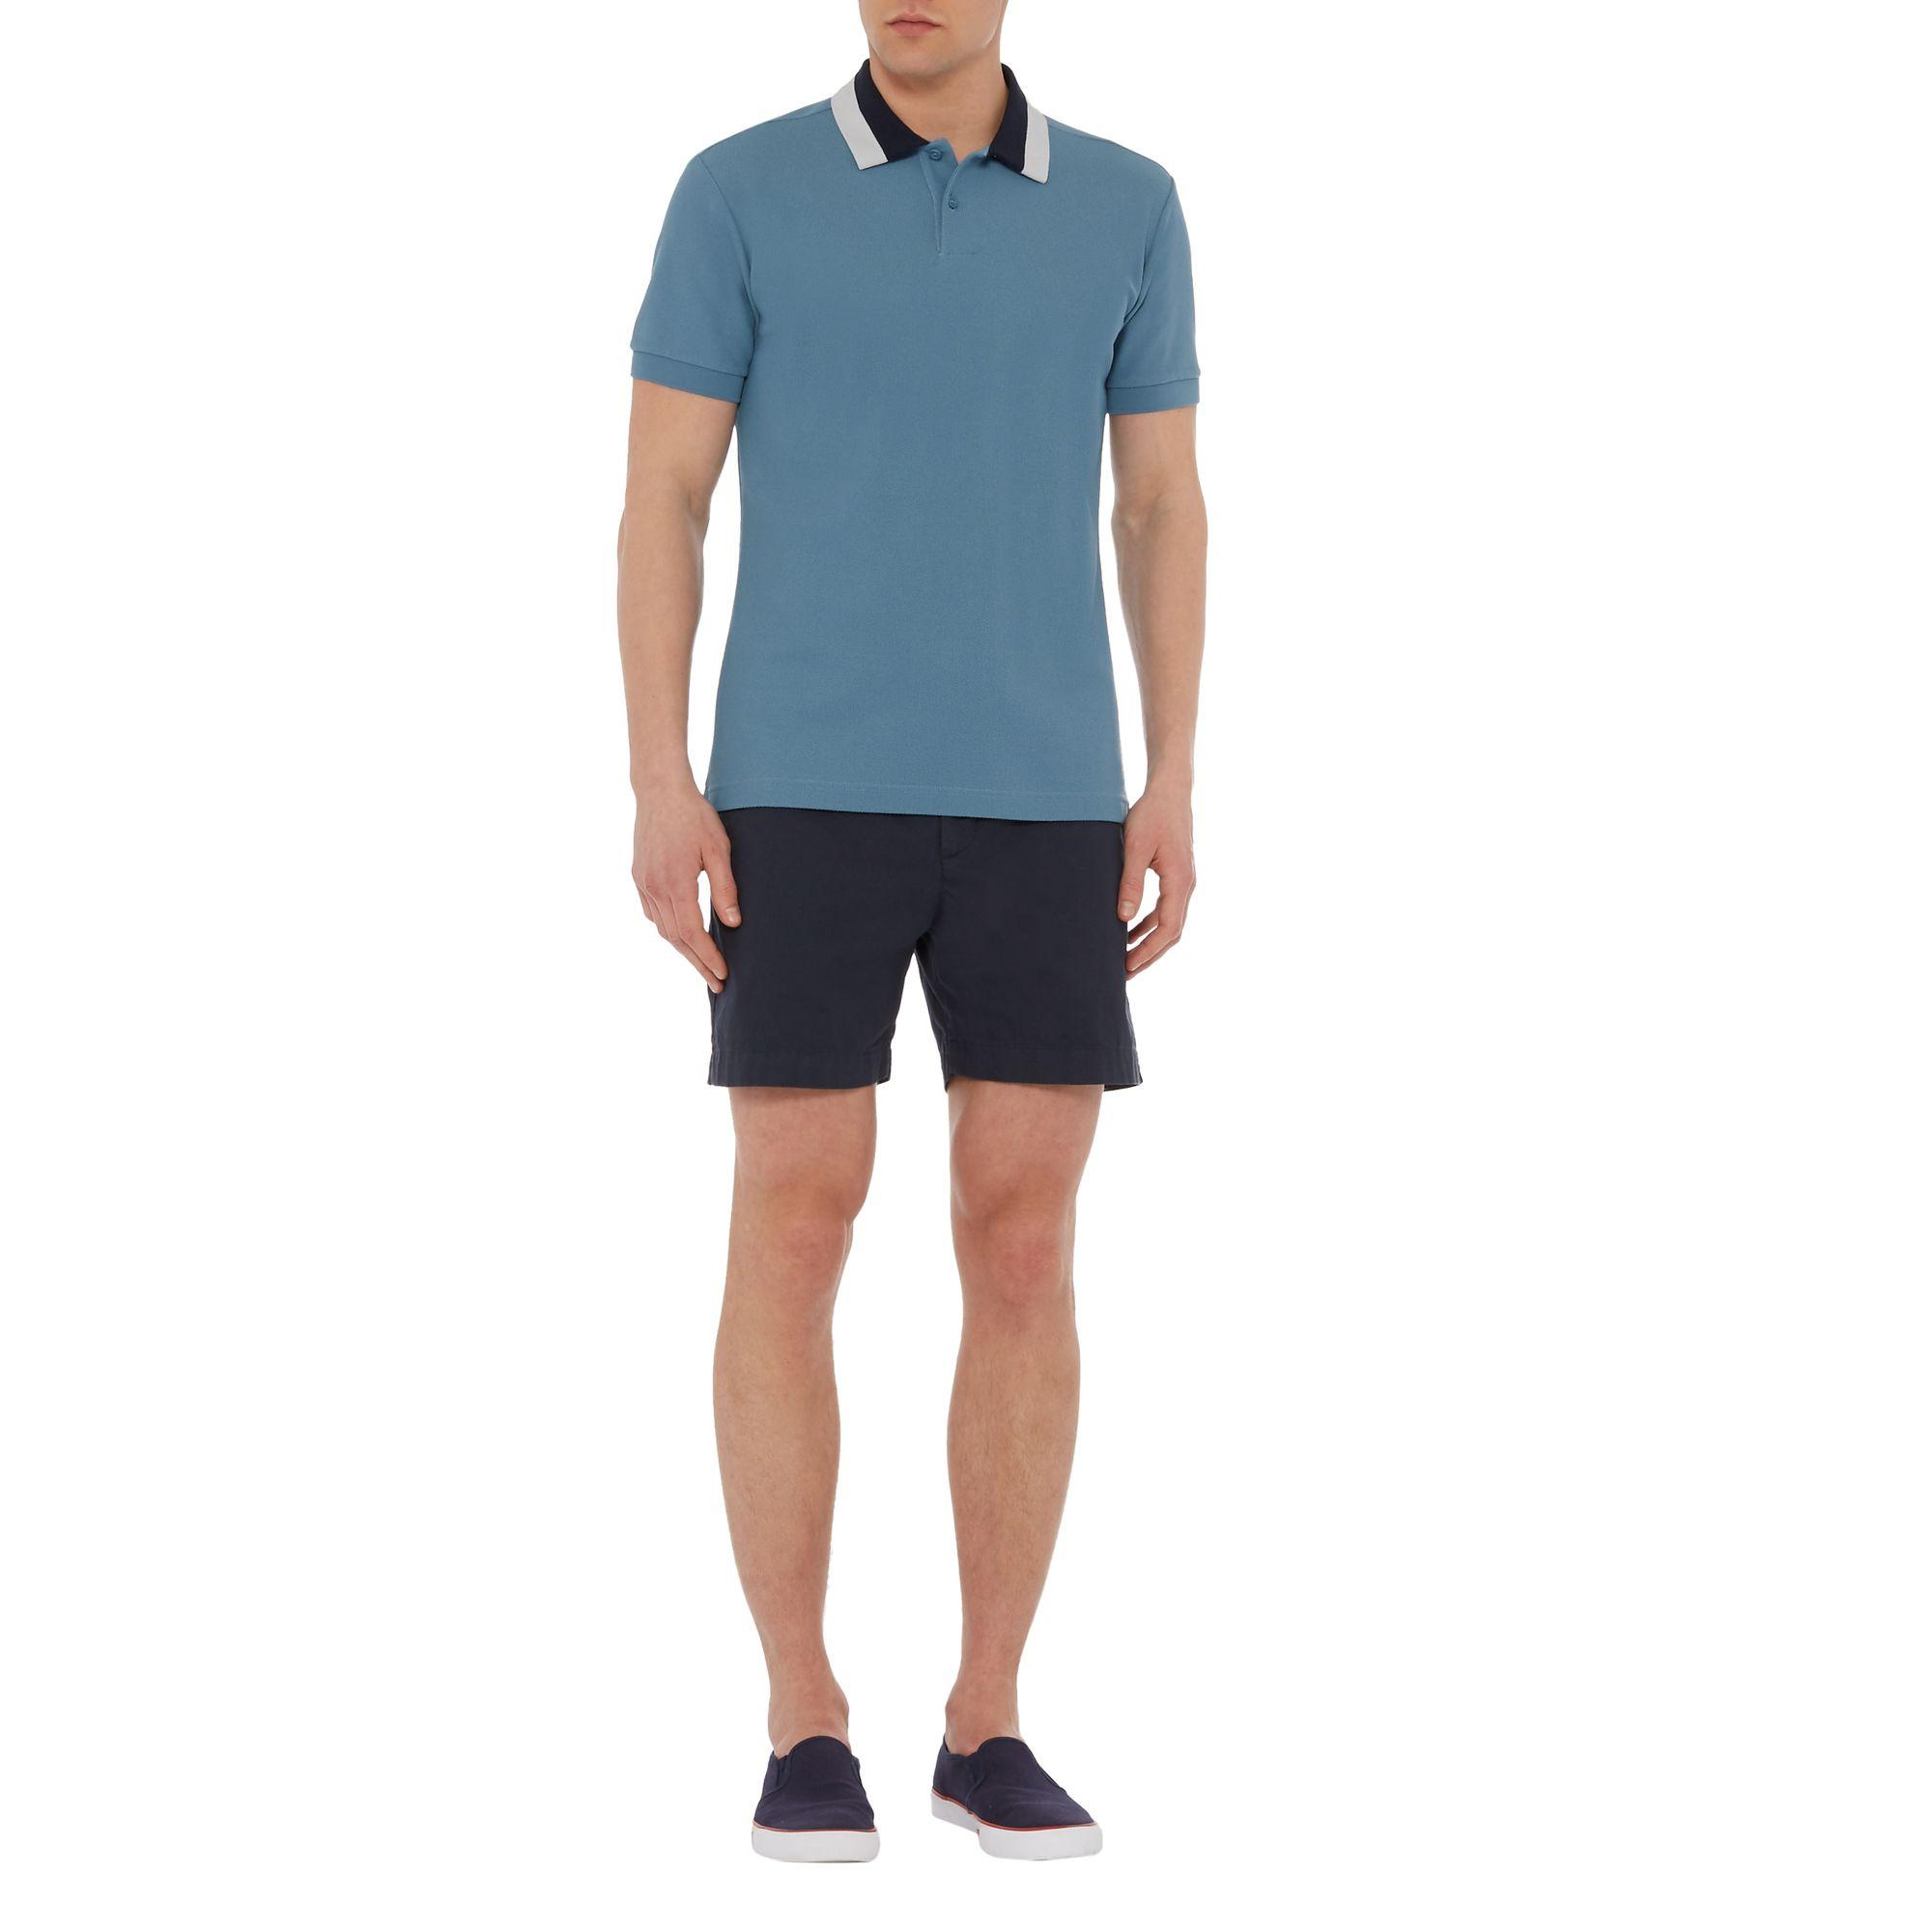 Orlebar Brown Cotton Judd in Blue for Men